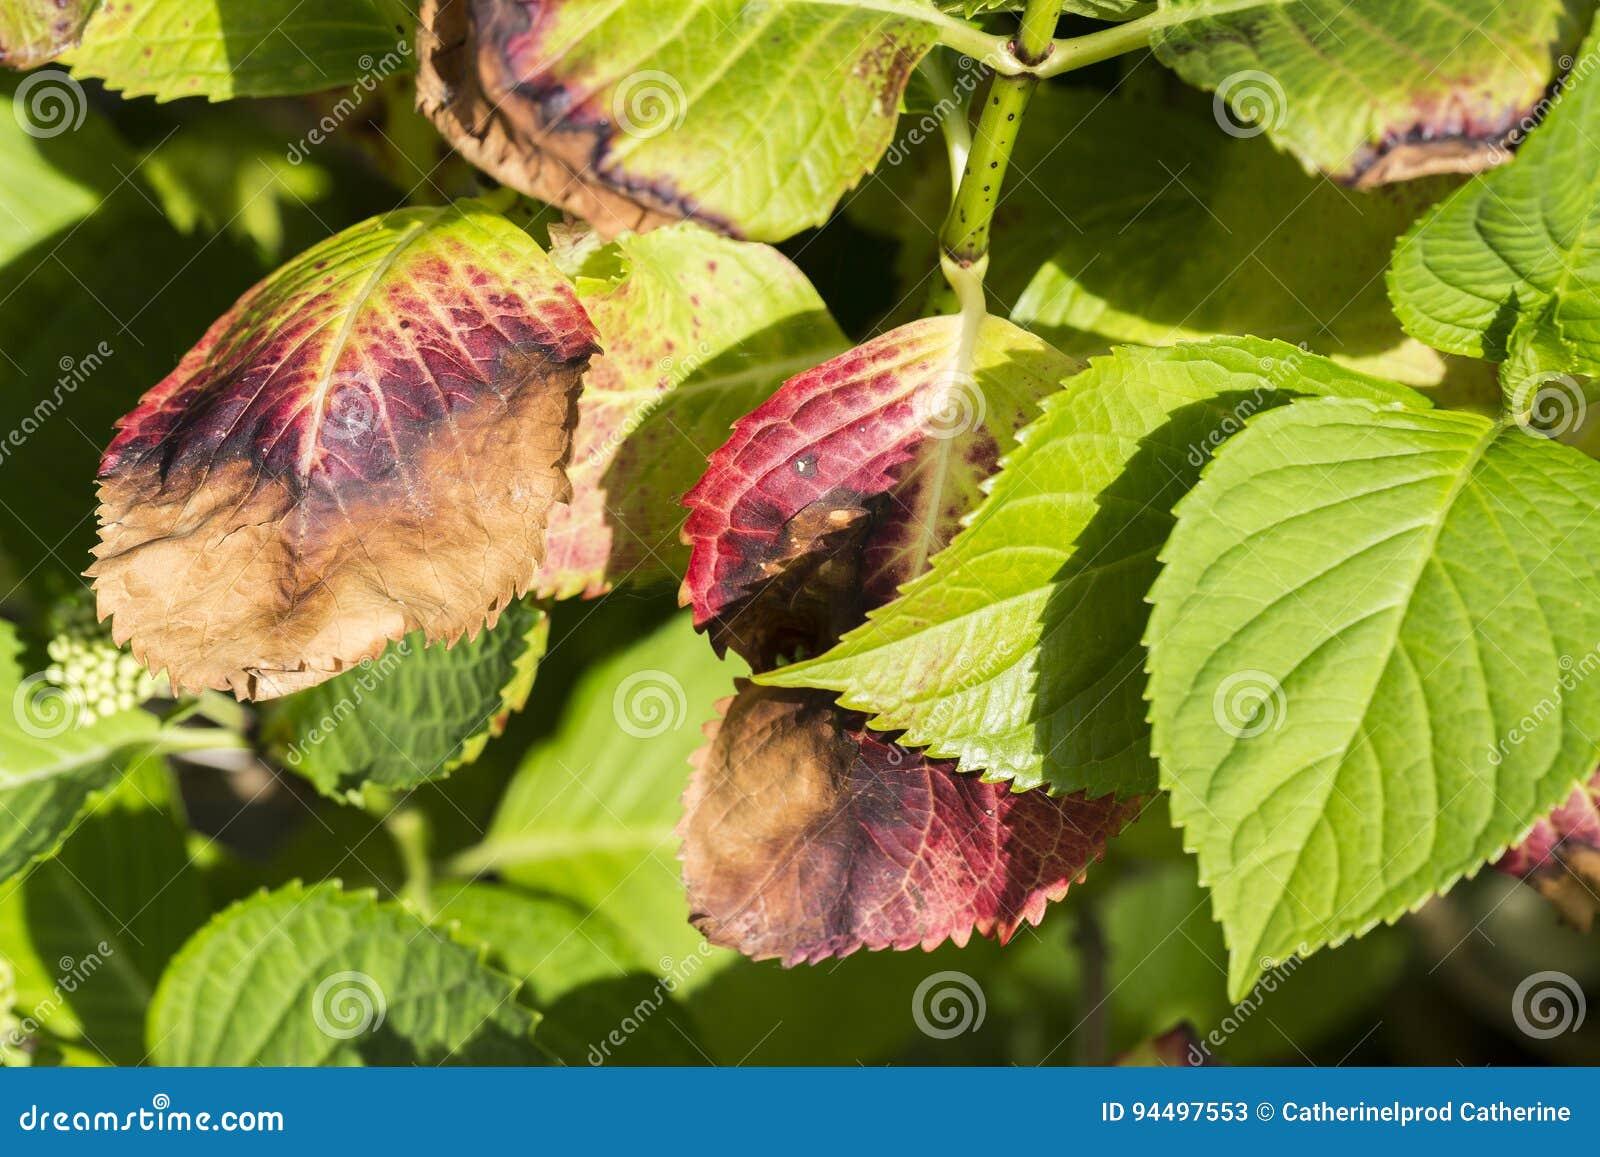 L 39 hortensia laisse la maladie congel e photo stock image 94497553 - Maladie des hortensias photos ...